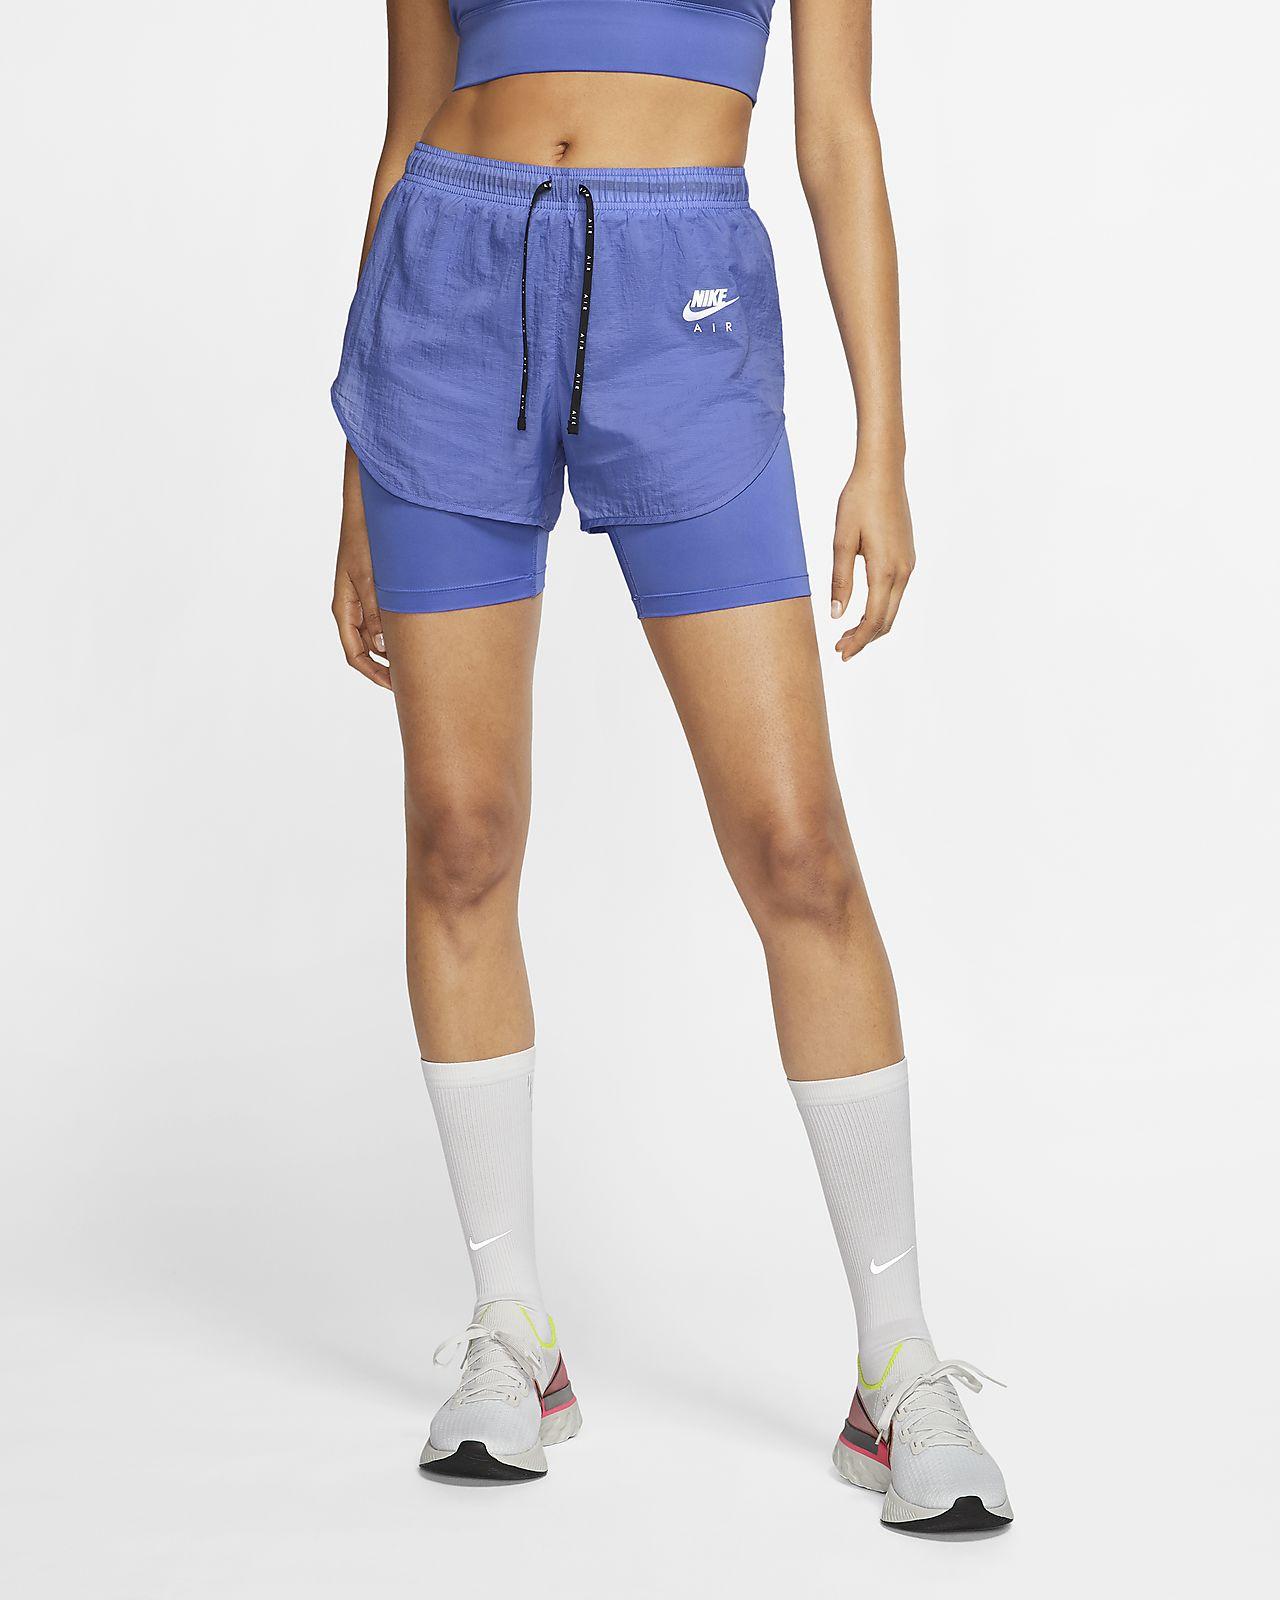 Nike Air Women's 2-in-1 Running Shorts